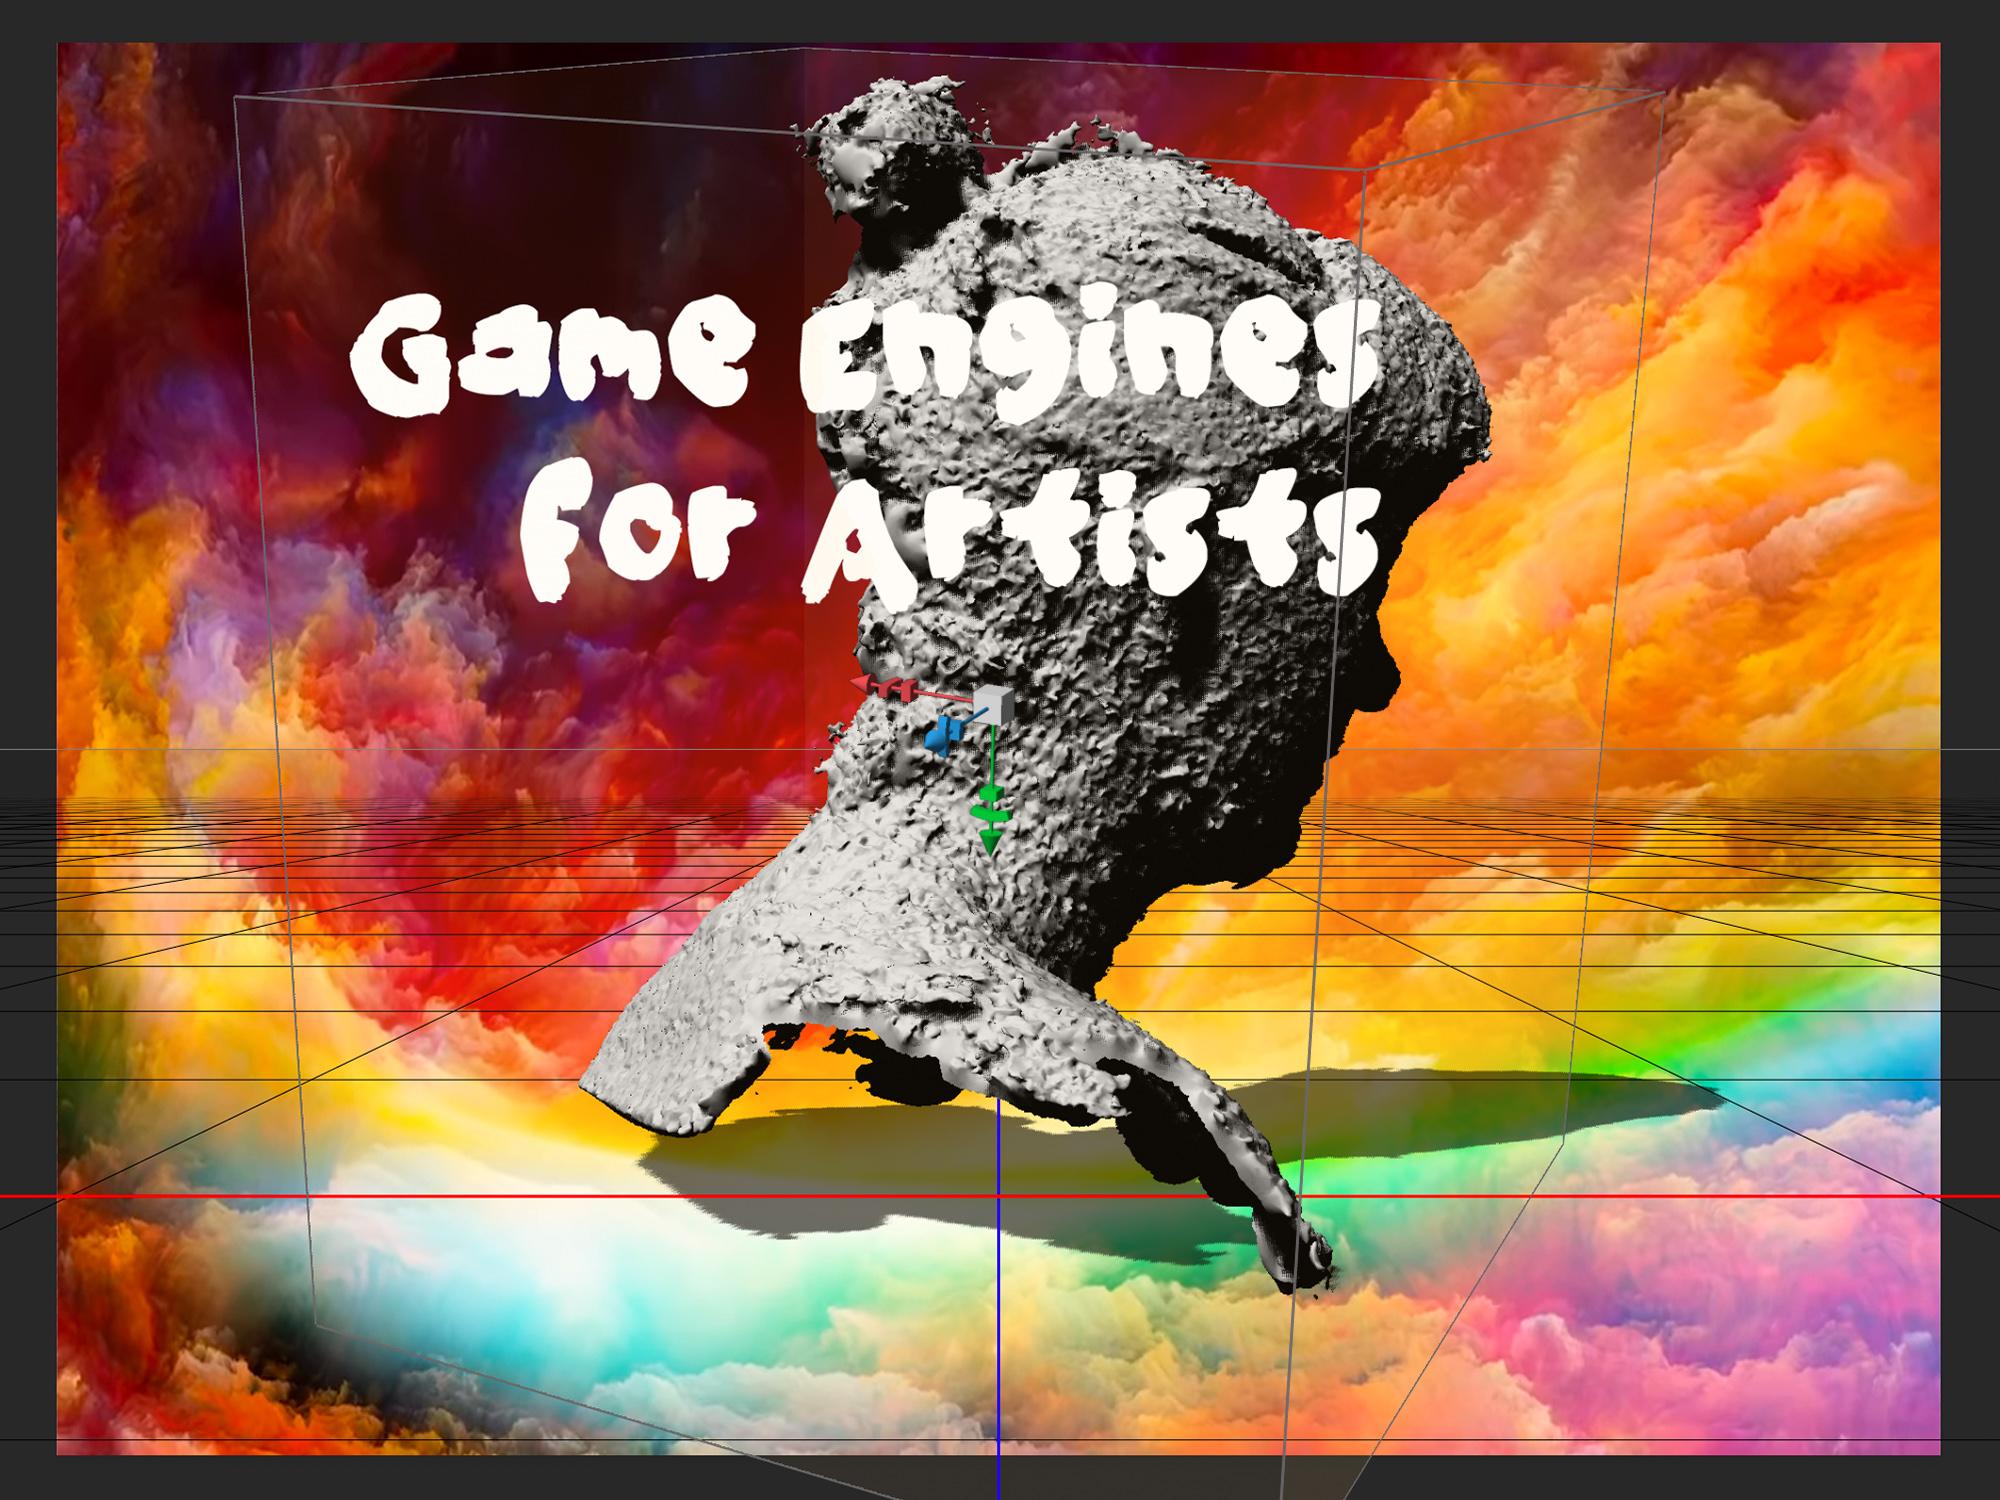 GameEnginesForArtistsInvite